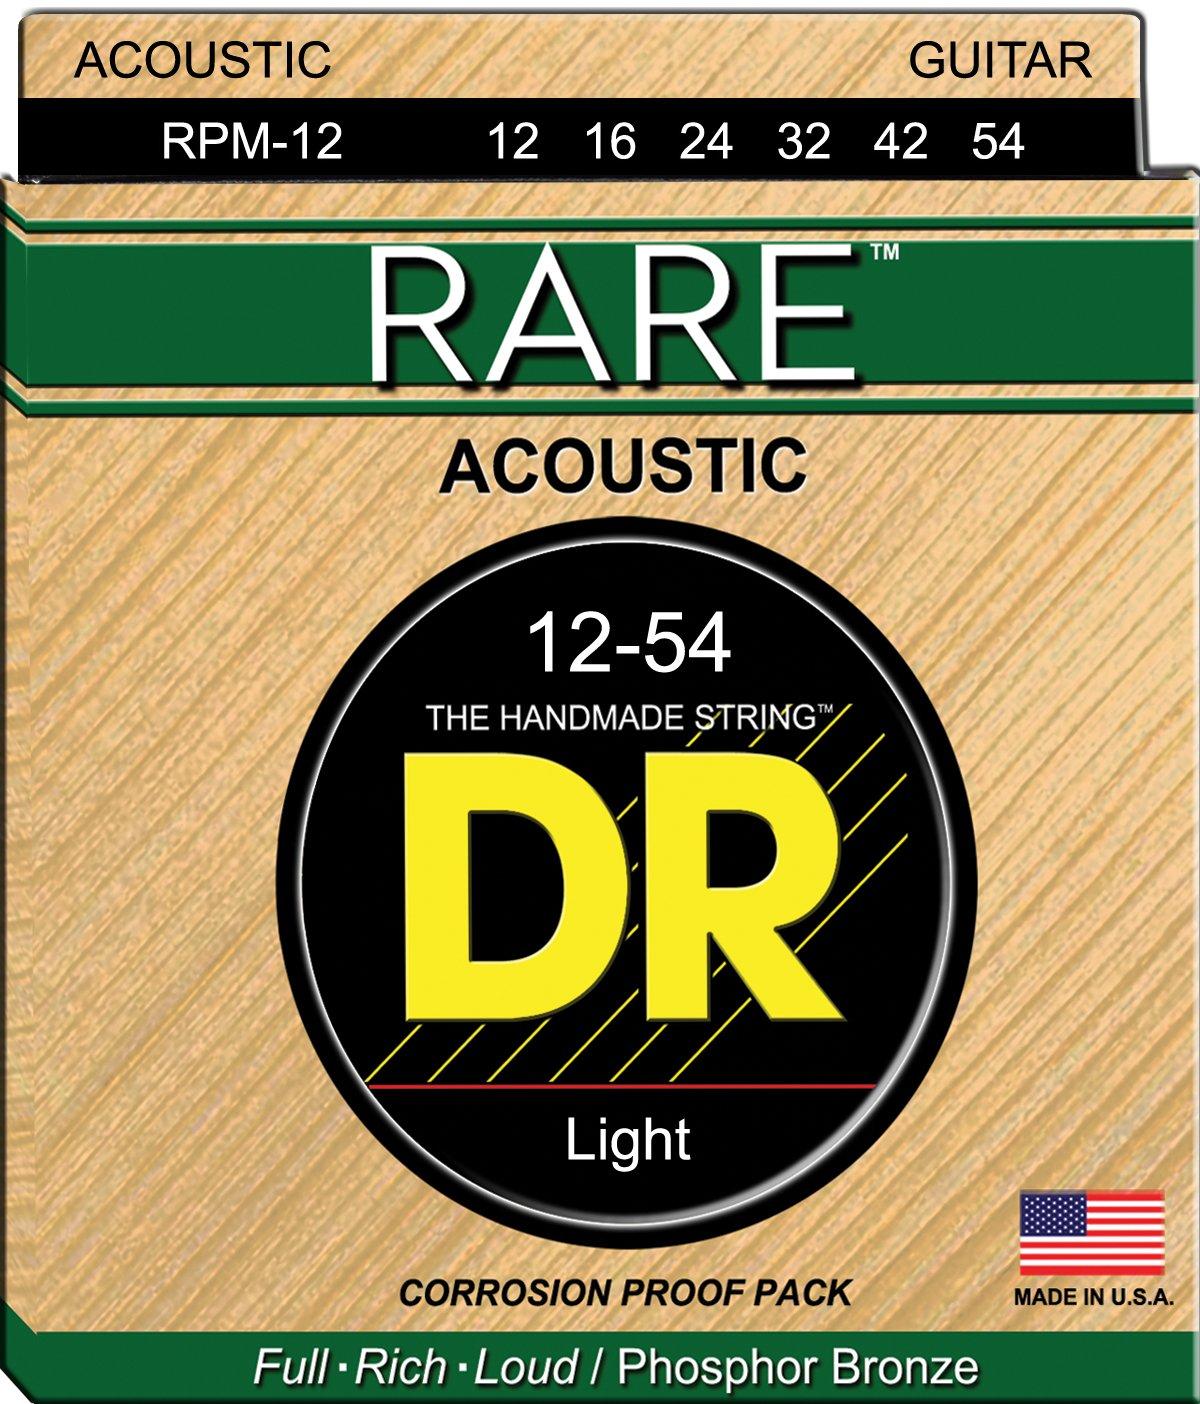 DR Strings RARE RPM-12 Acoustic Guitar Strings, Medium, 12-54